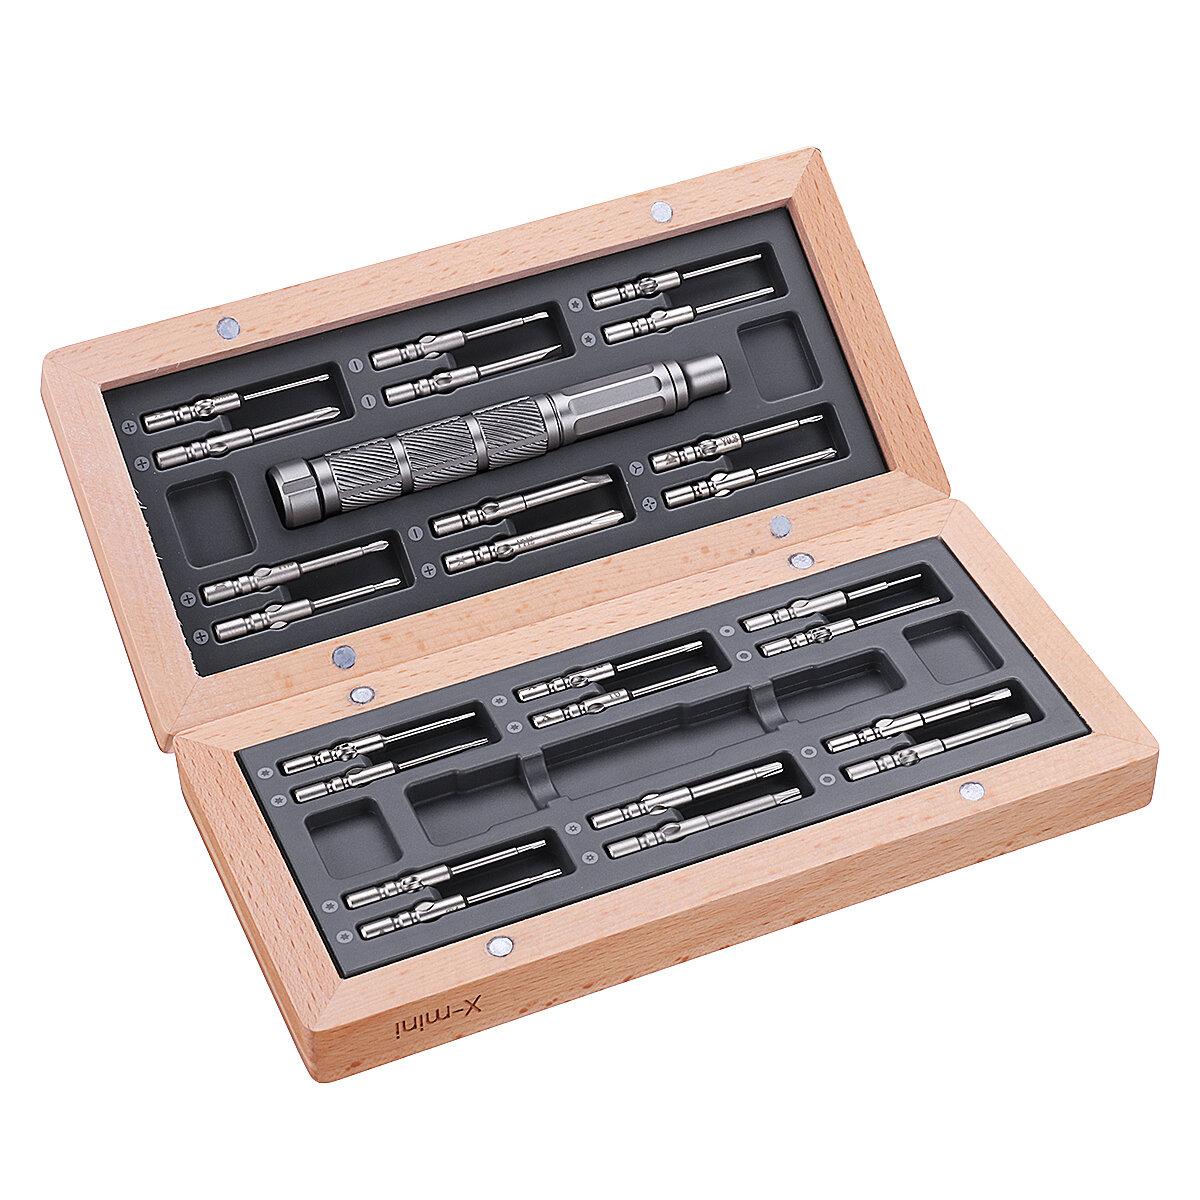 ATuMan X-mini 24 In 1 Multi-purpose Precision Screwdriver Set Repair Tool with Magnetic Storage